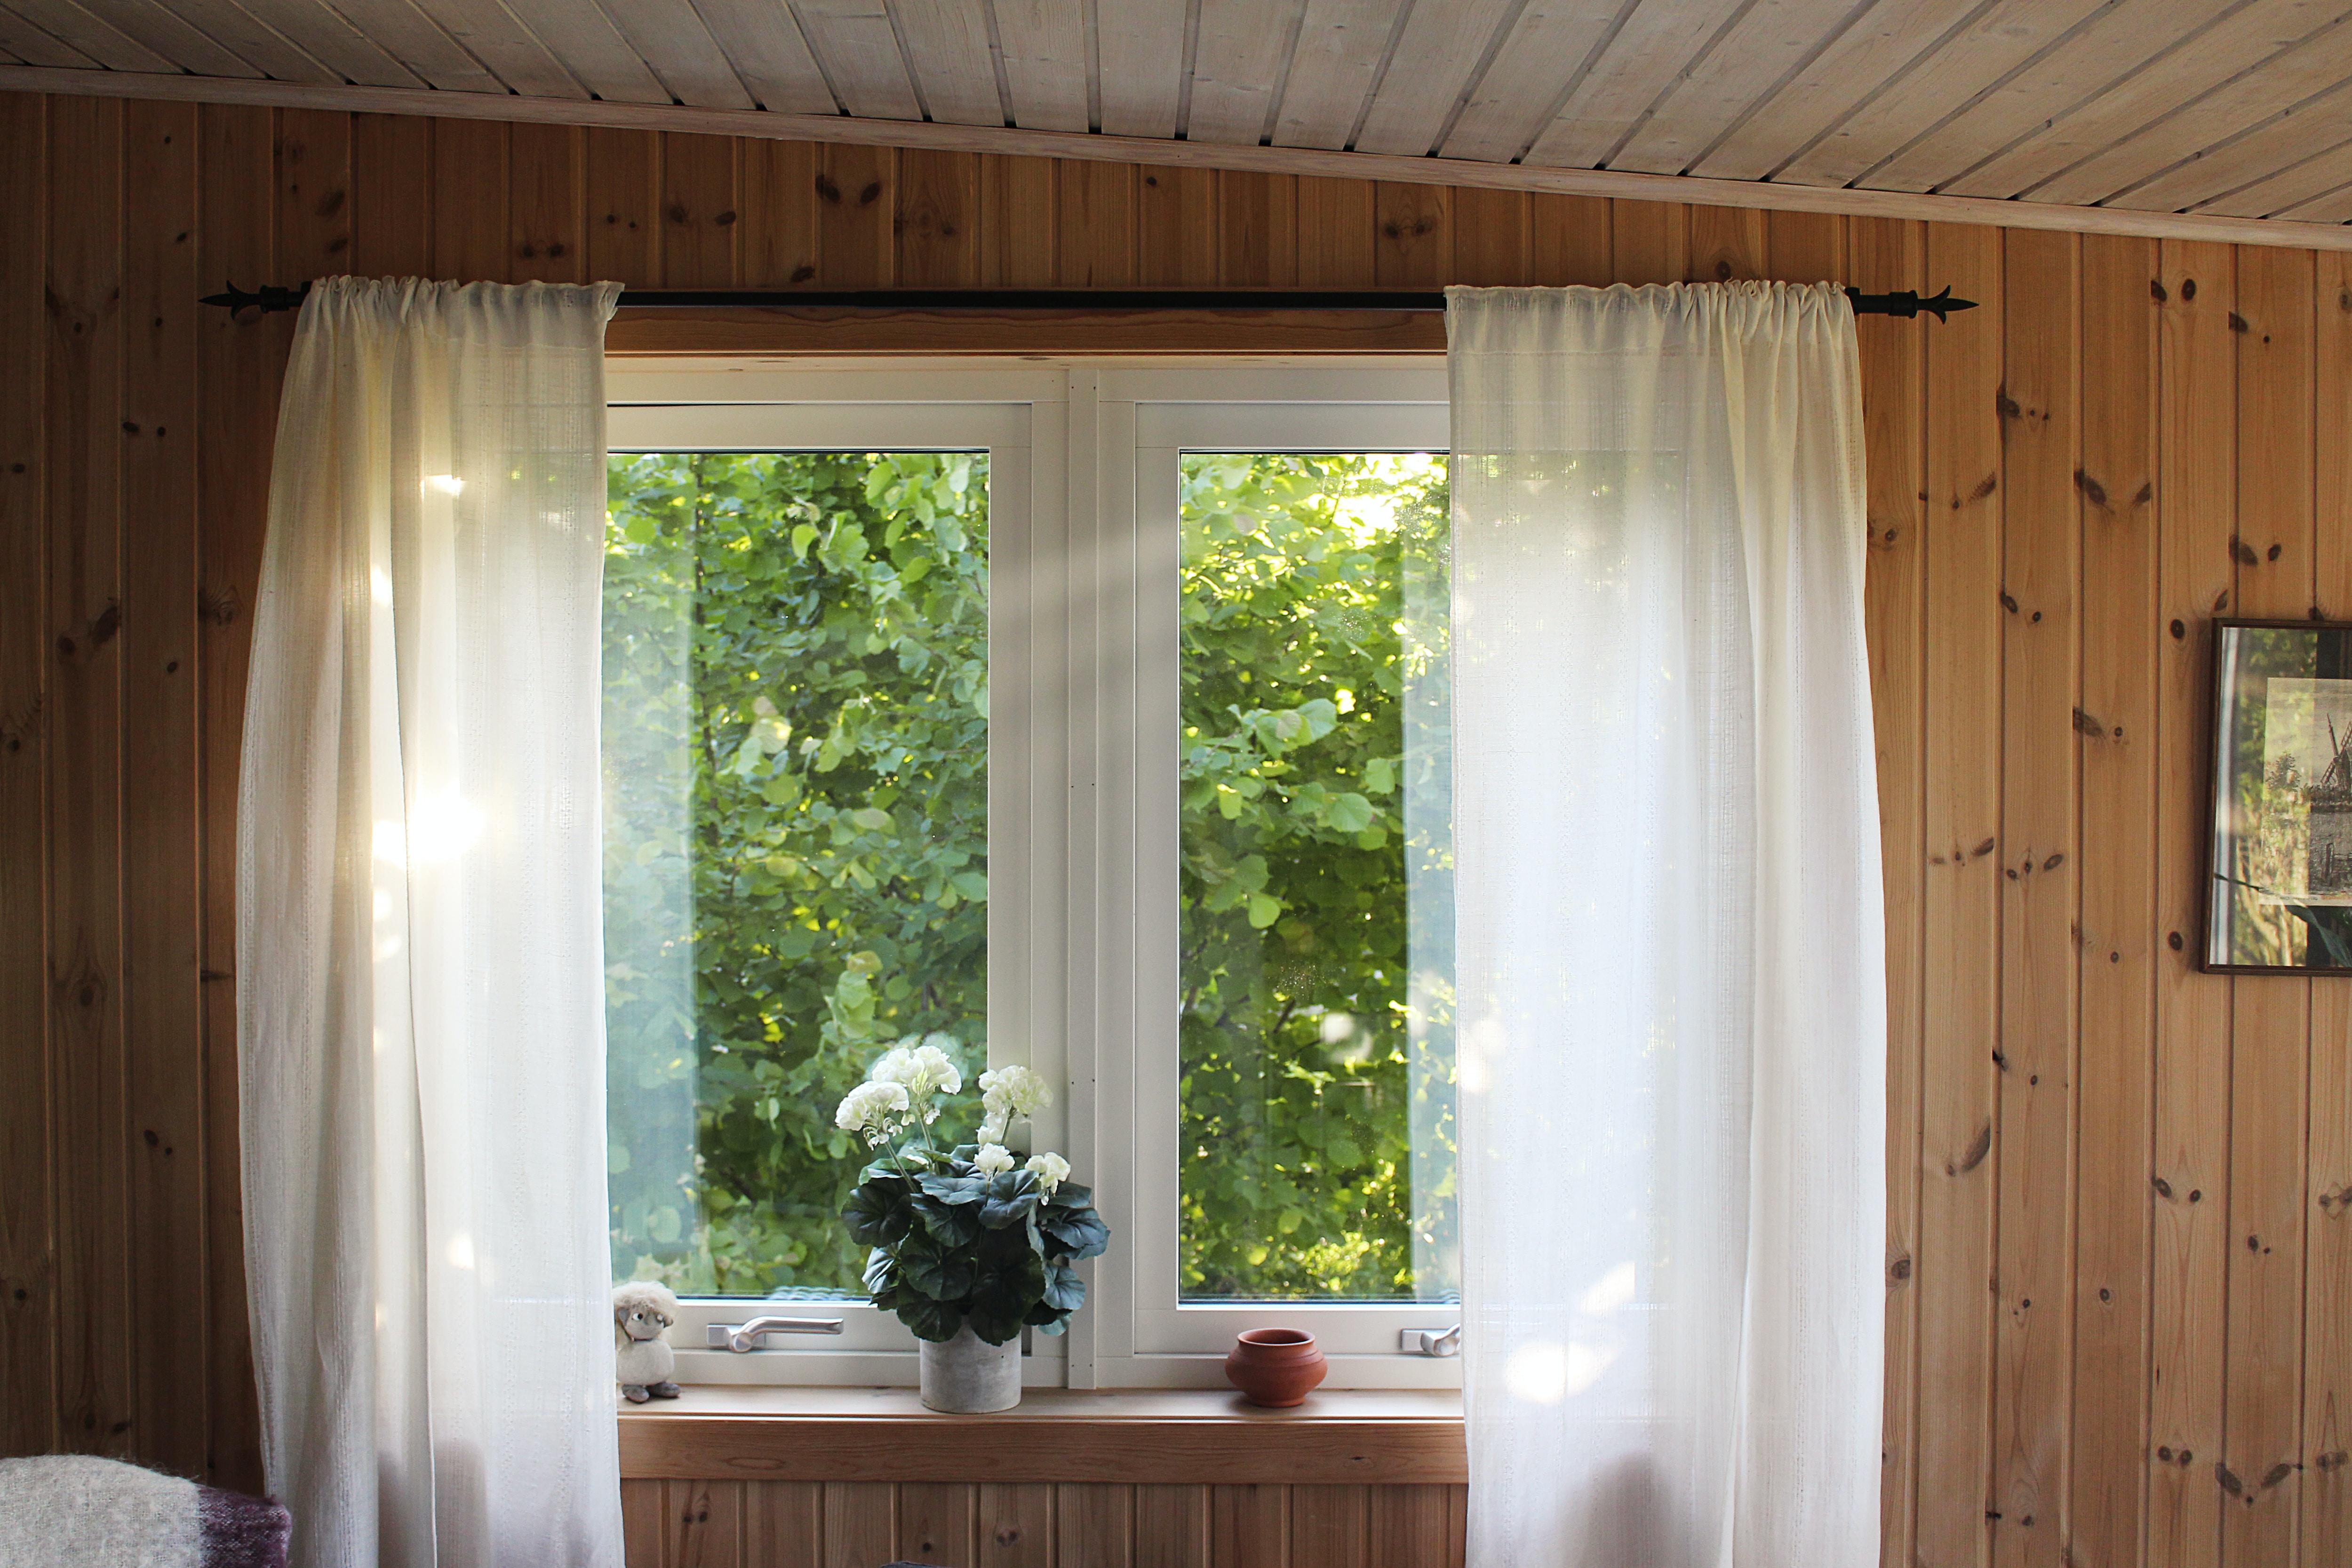 white rod pocket curtain on window frame